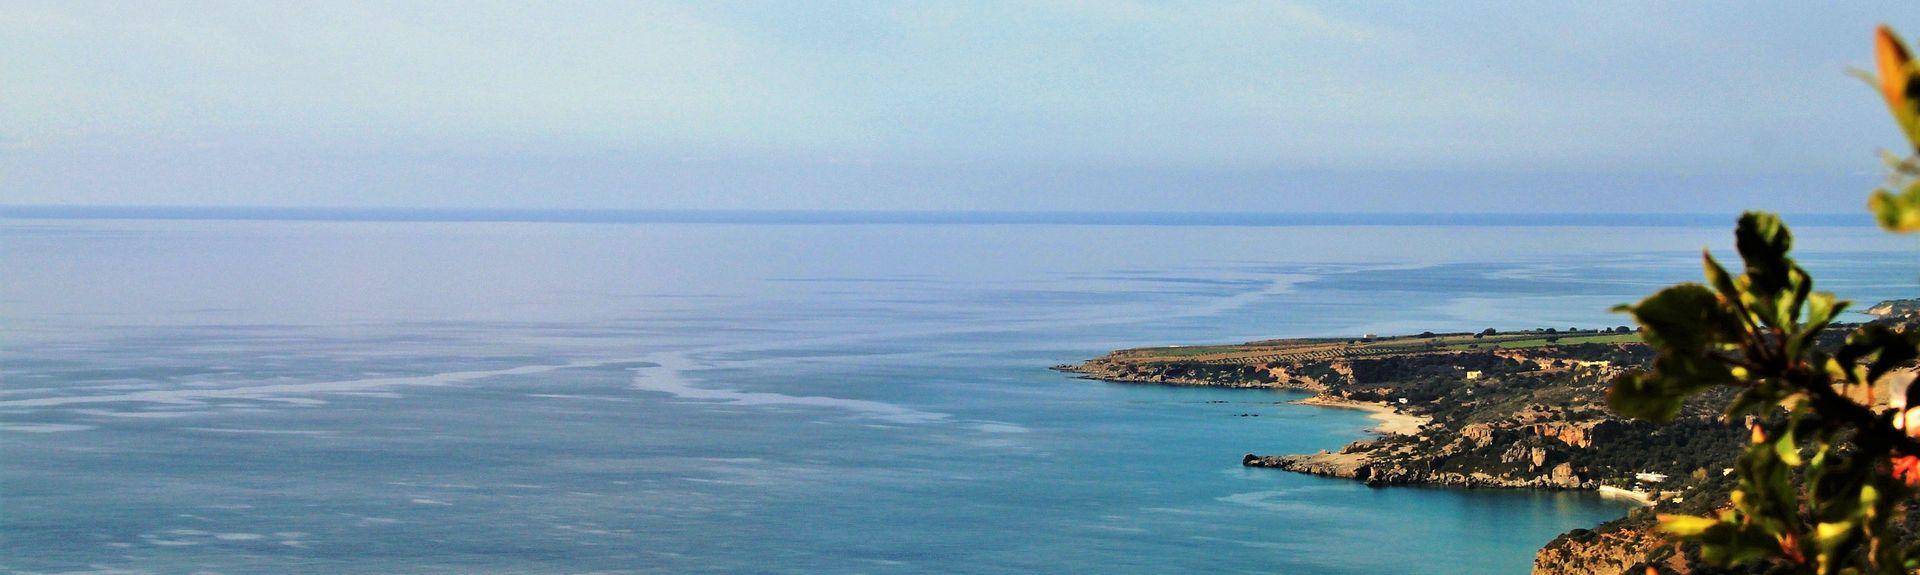 Patsianos, Crete, Greece